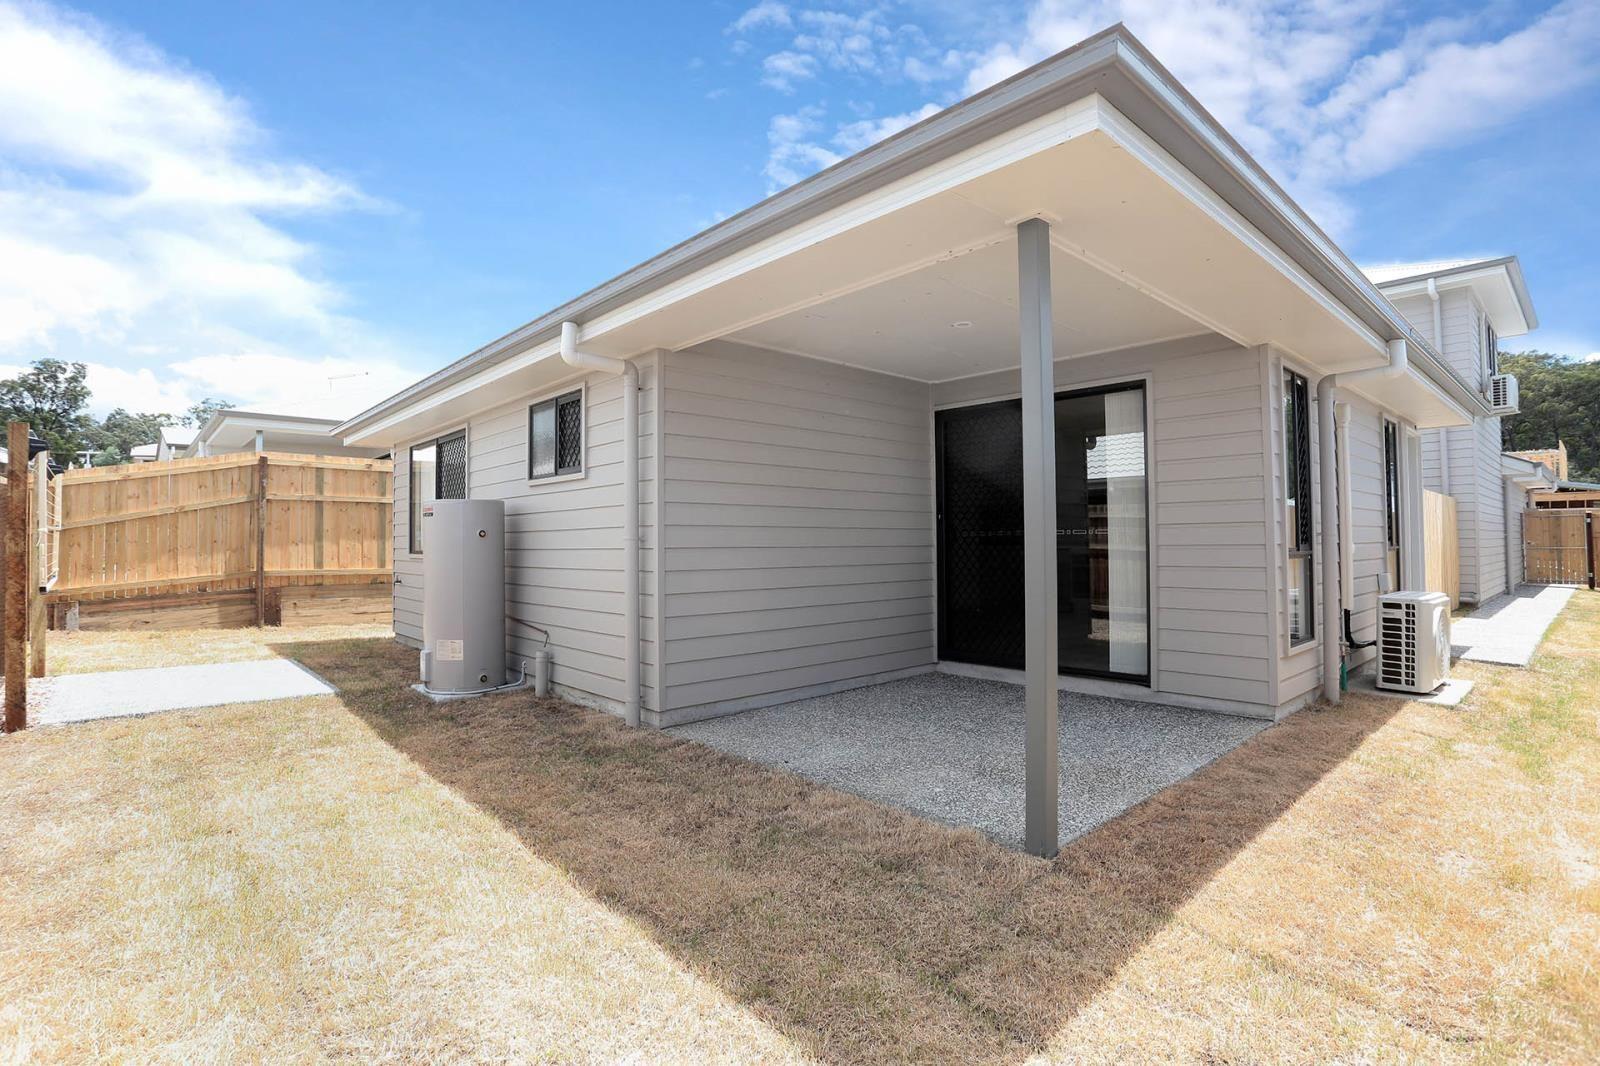 2/34 Dalby Street, Holmview QLD 4207, Image 2